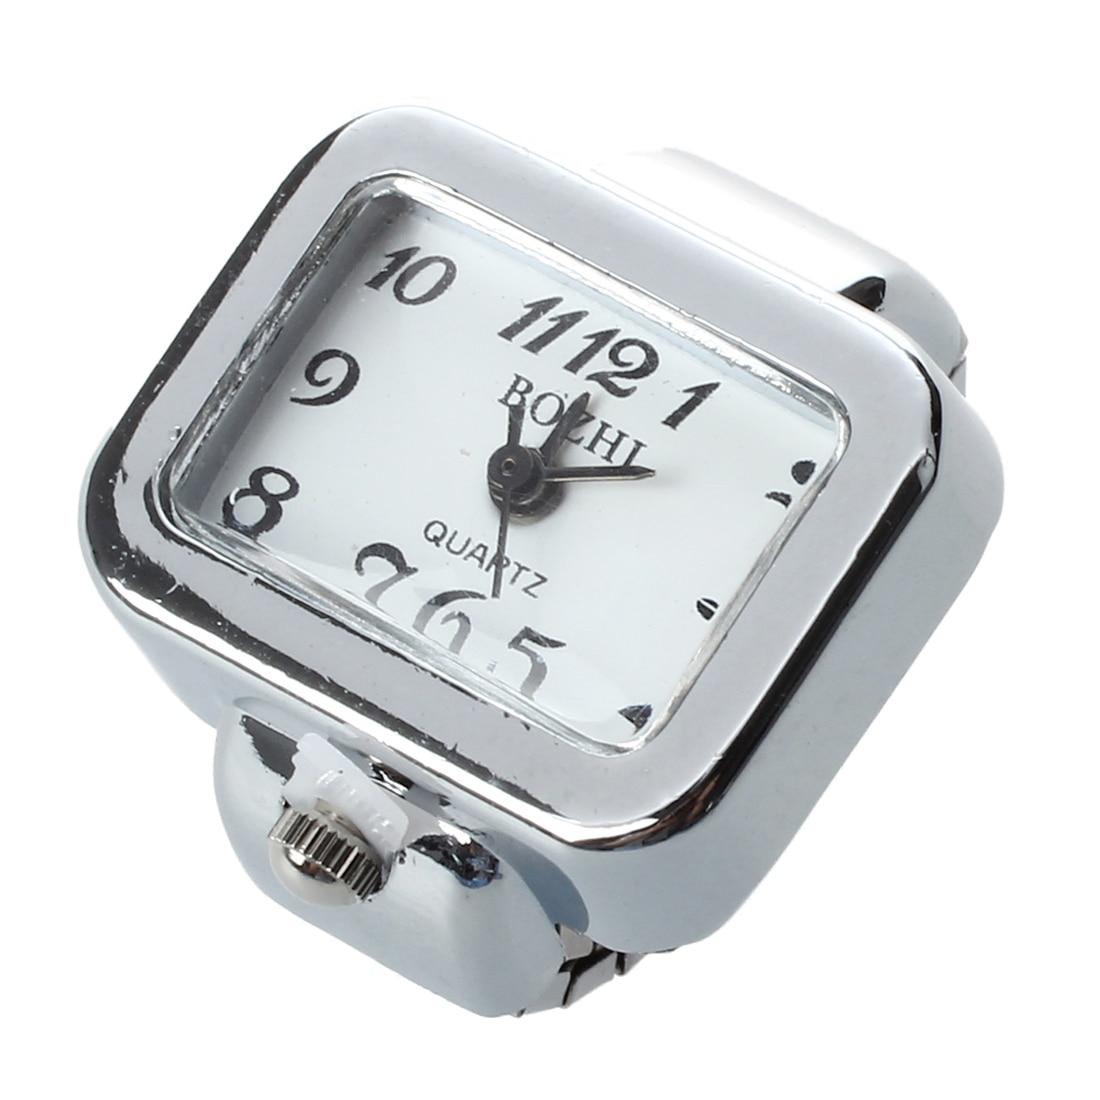 Reloj de cuarzo anillo reloj digital Dial árabe rectángulo blanco Unisex joyería